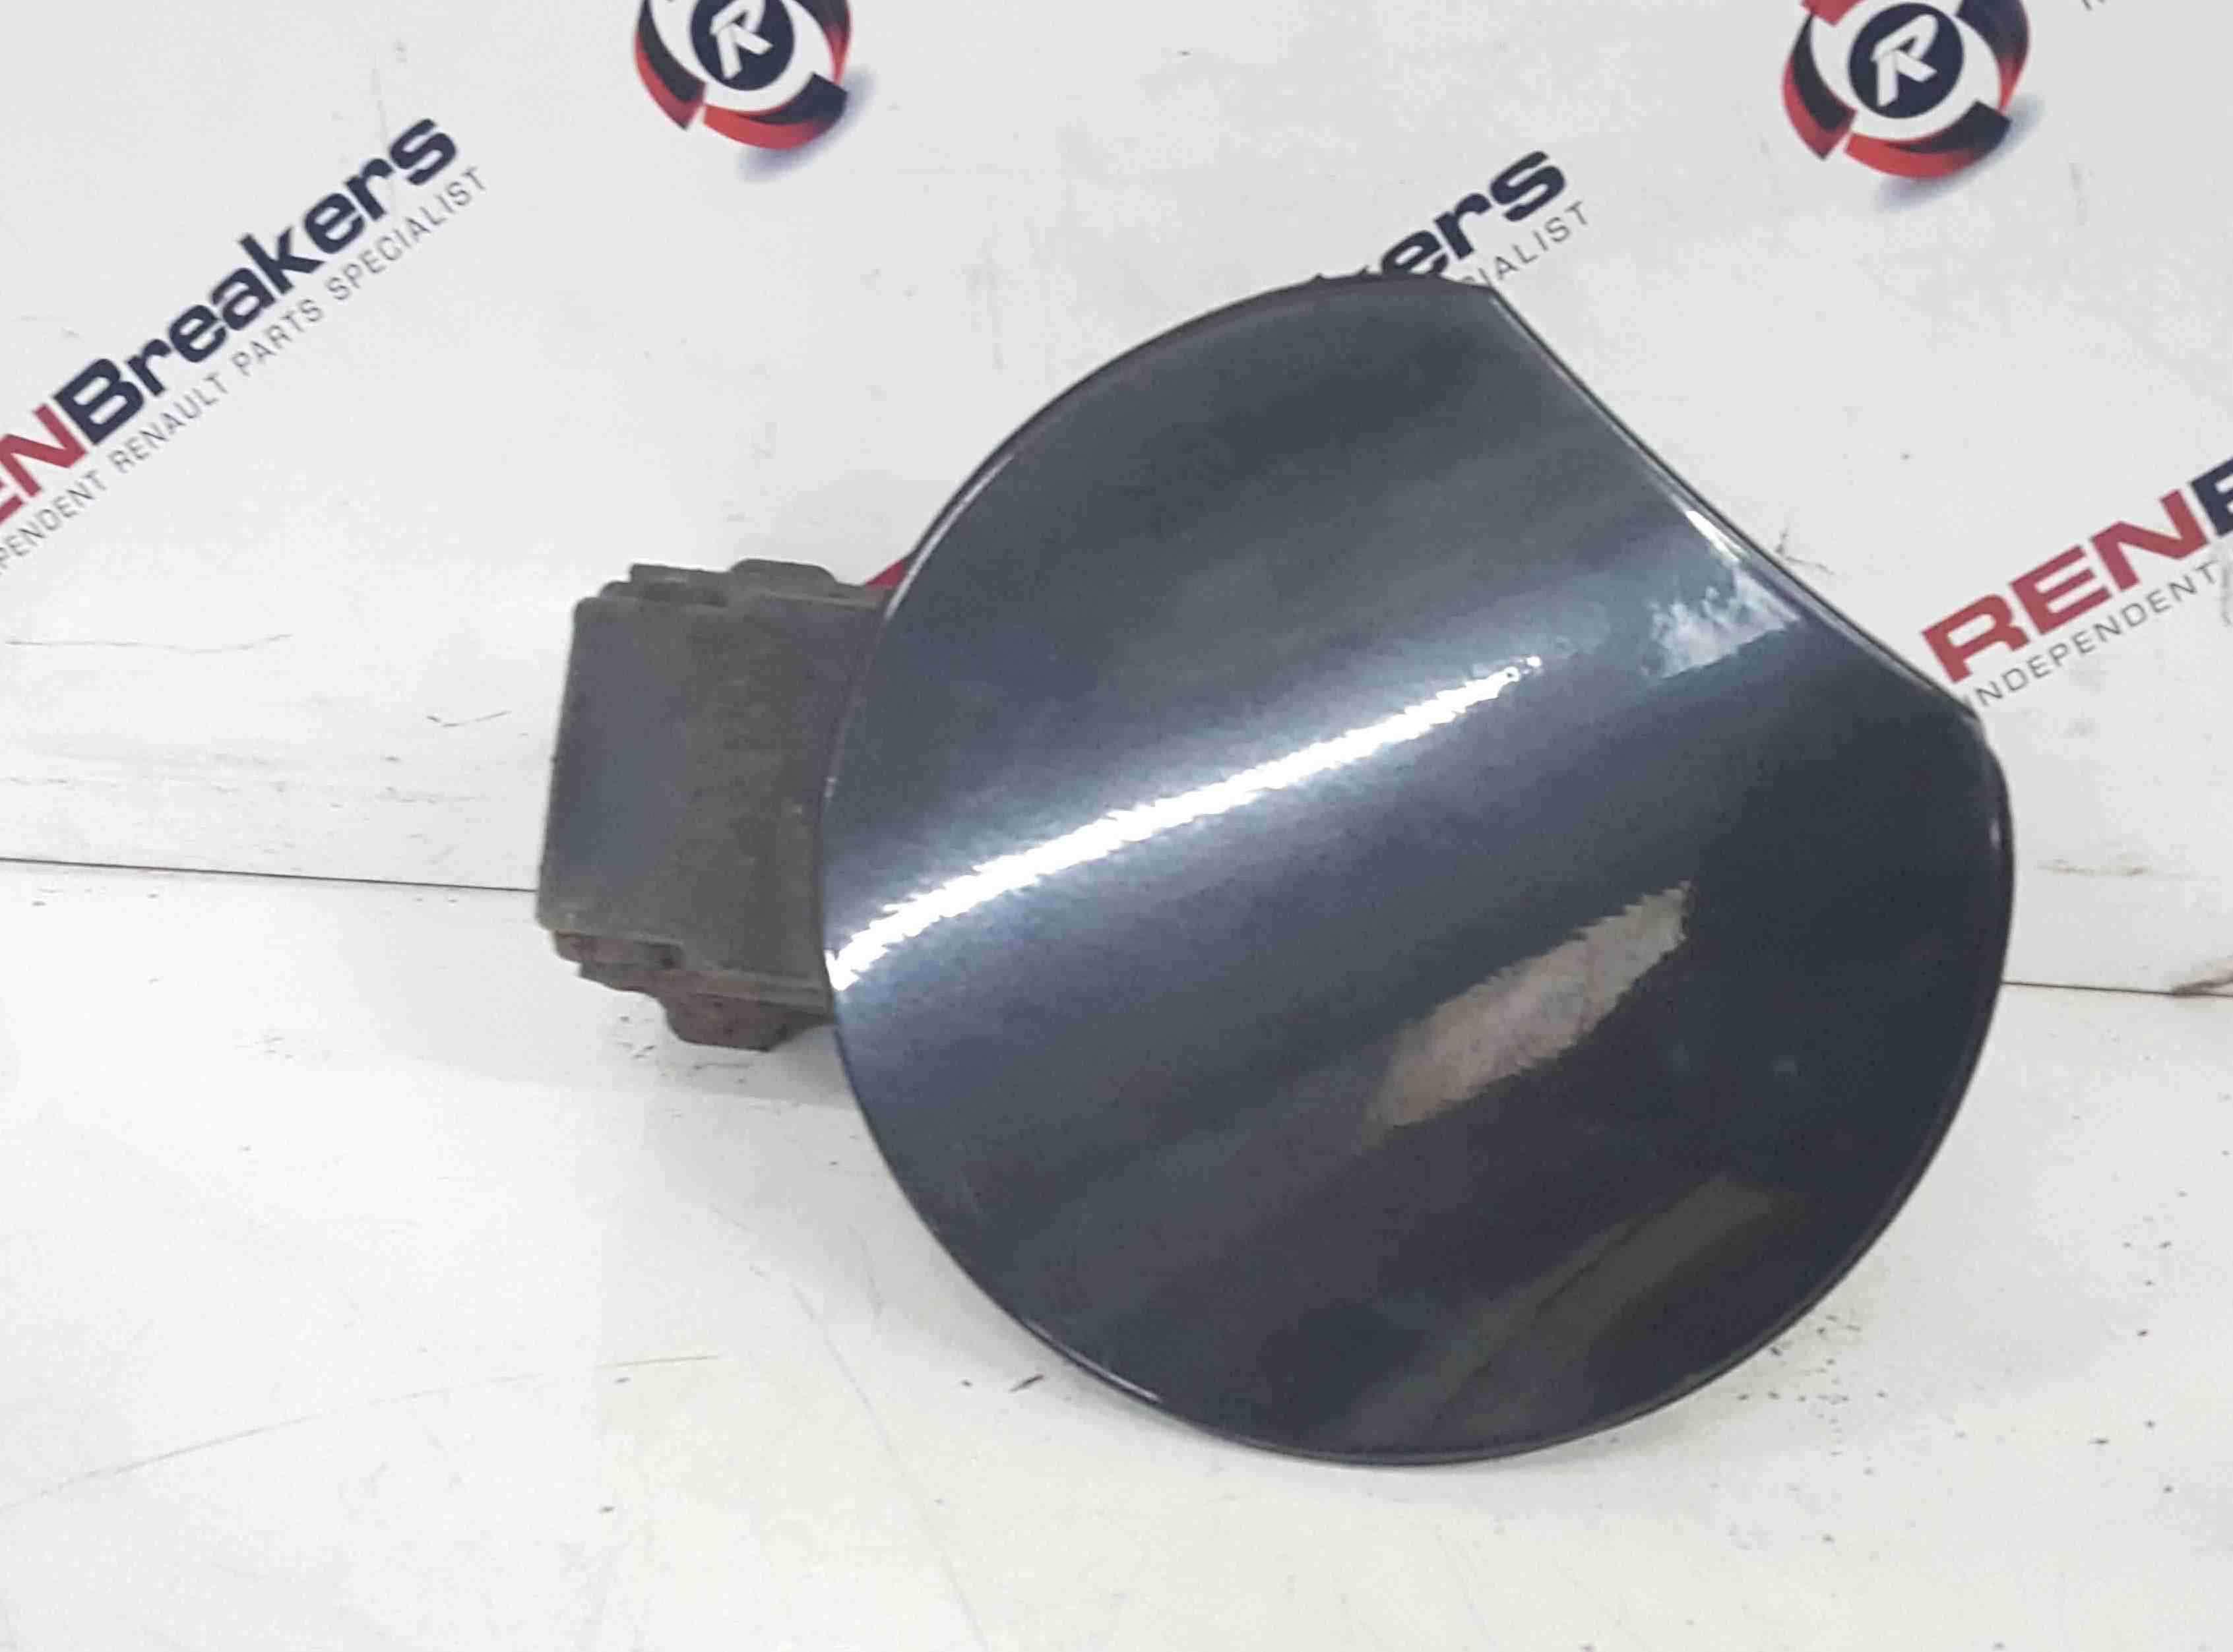 Renault Wind 2010-2013 Fuel Flap Cover Black 676 + Backing